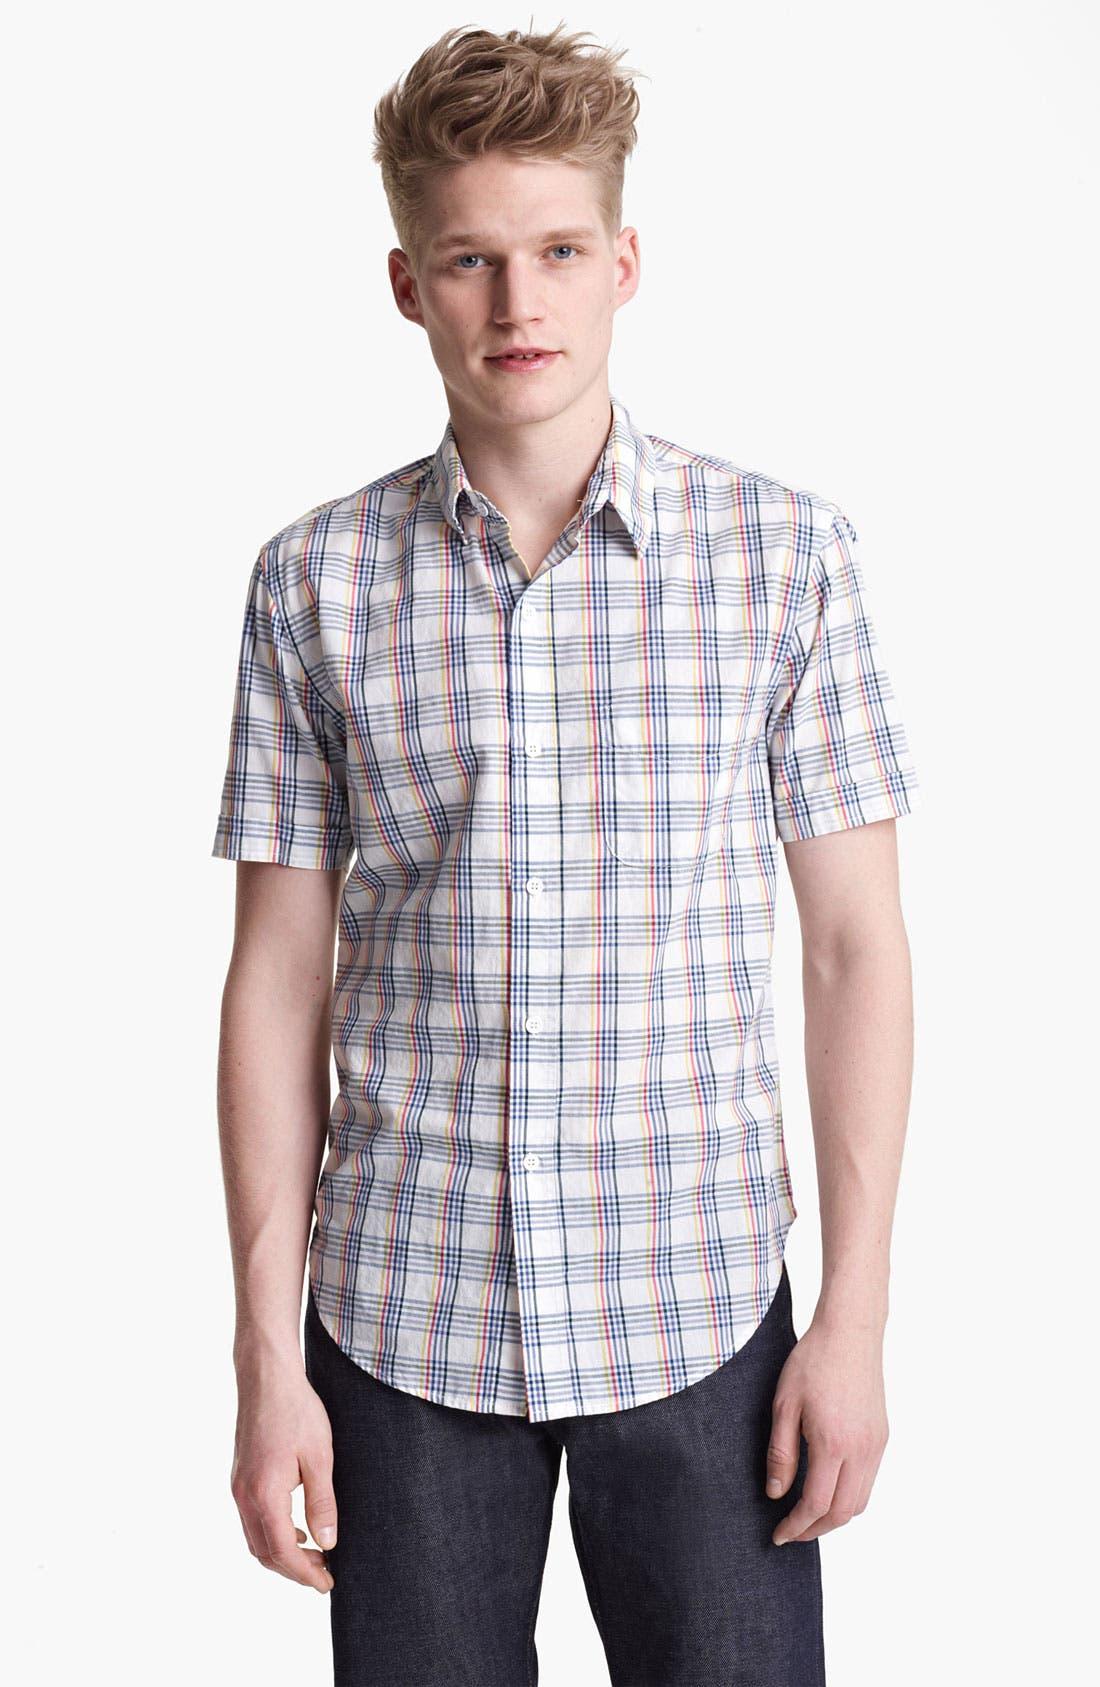 Main Image - Band of Outsiders Multi Check Woven Shirt